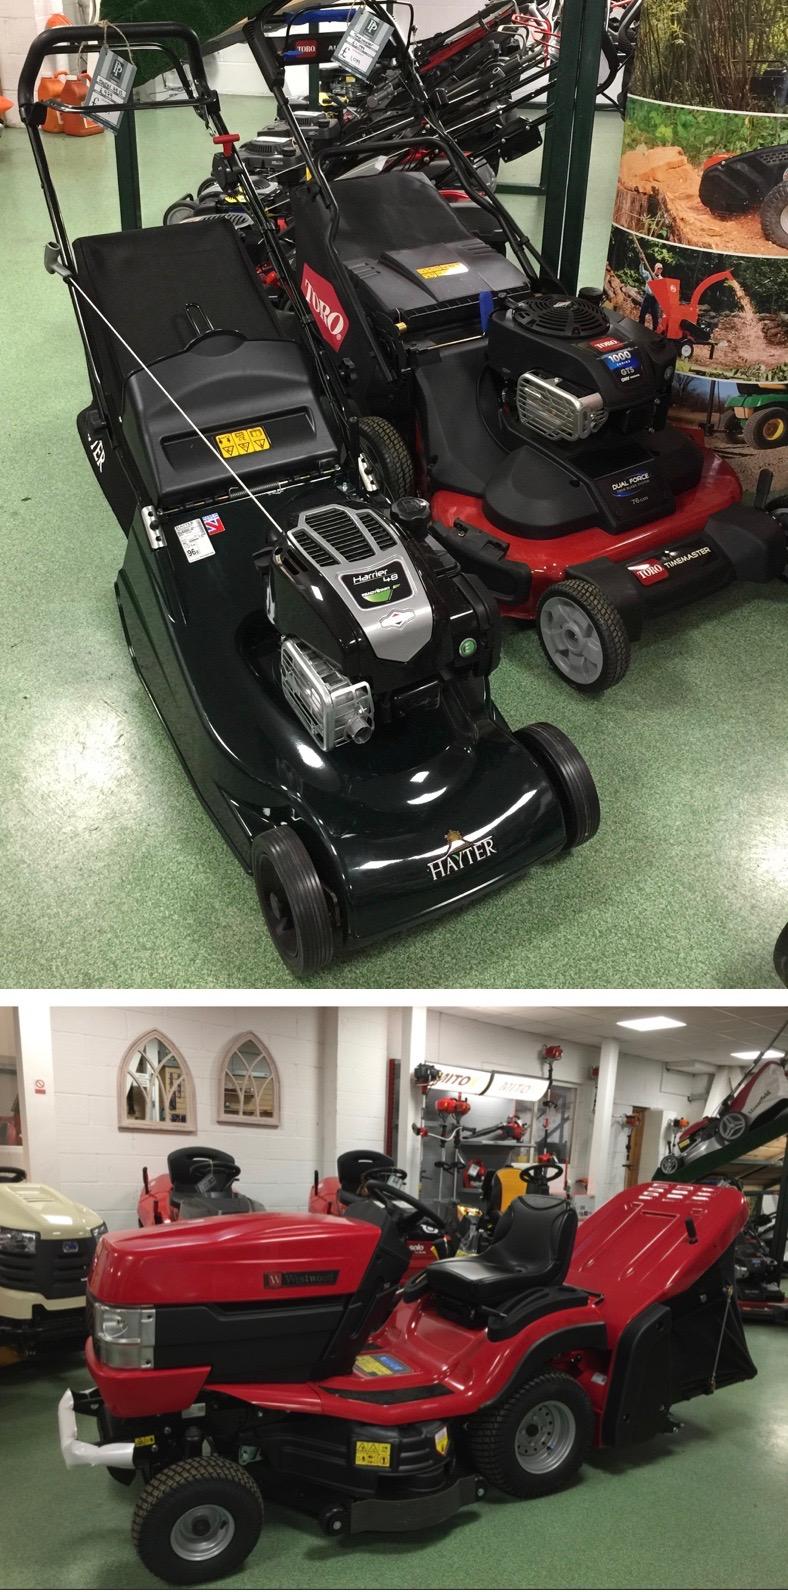 pp-estates-discounted-hayters-westwood-garden-tractors